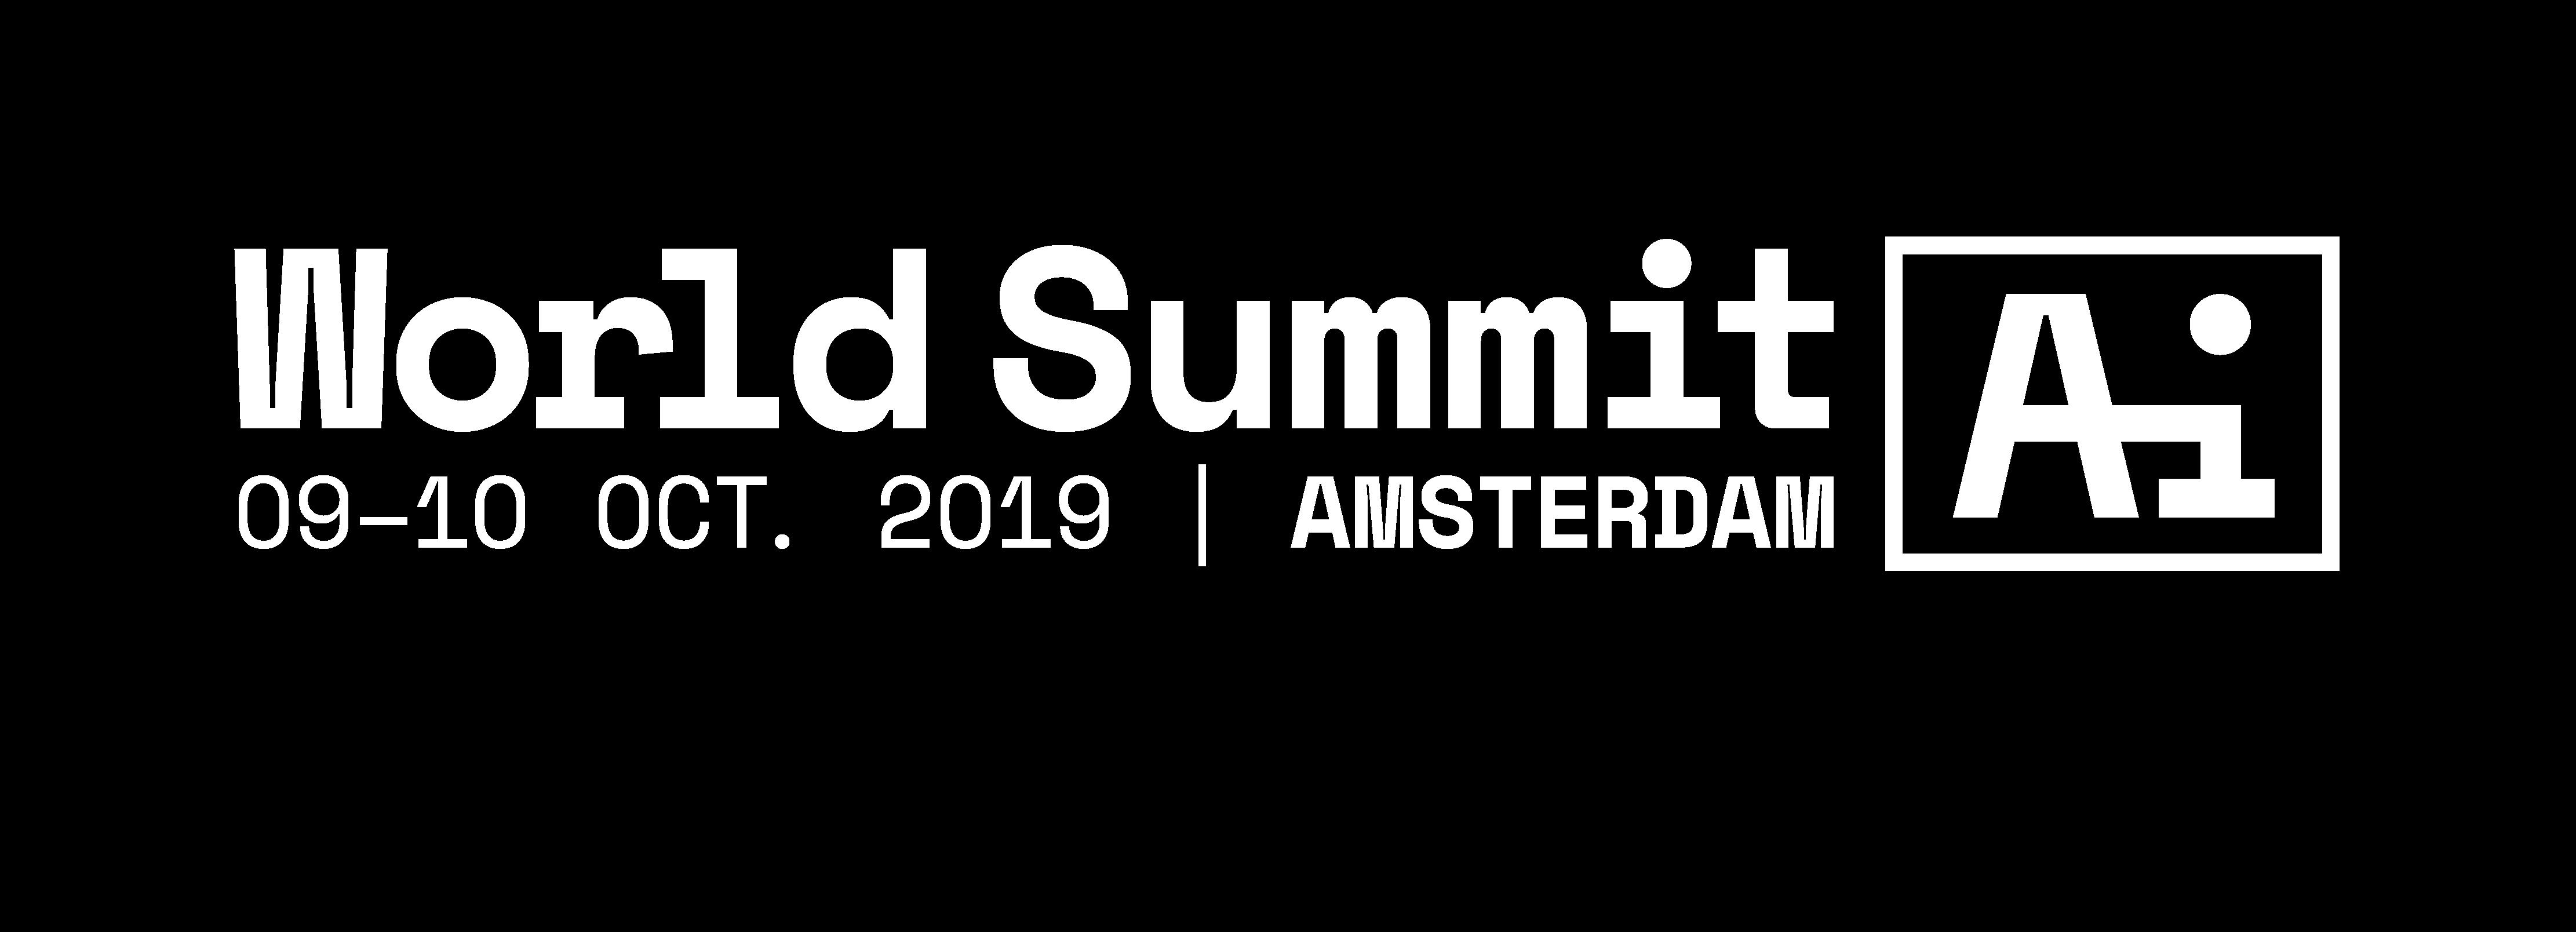 World Summit AI | The World's Leading AI Summit | Oct 2019 | Amsterdam